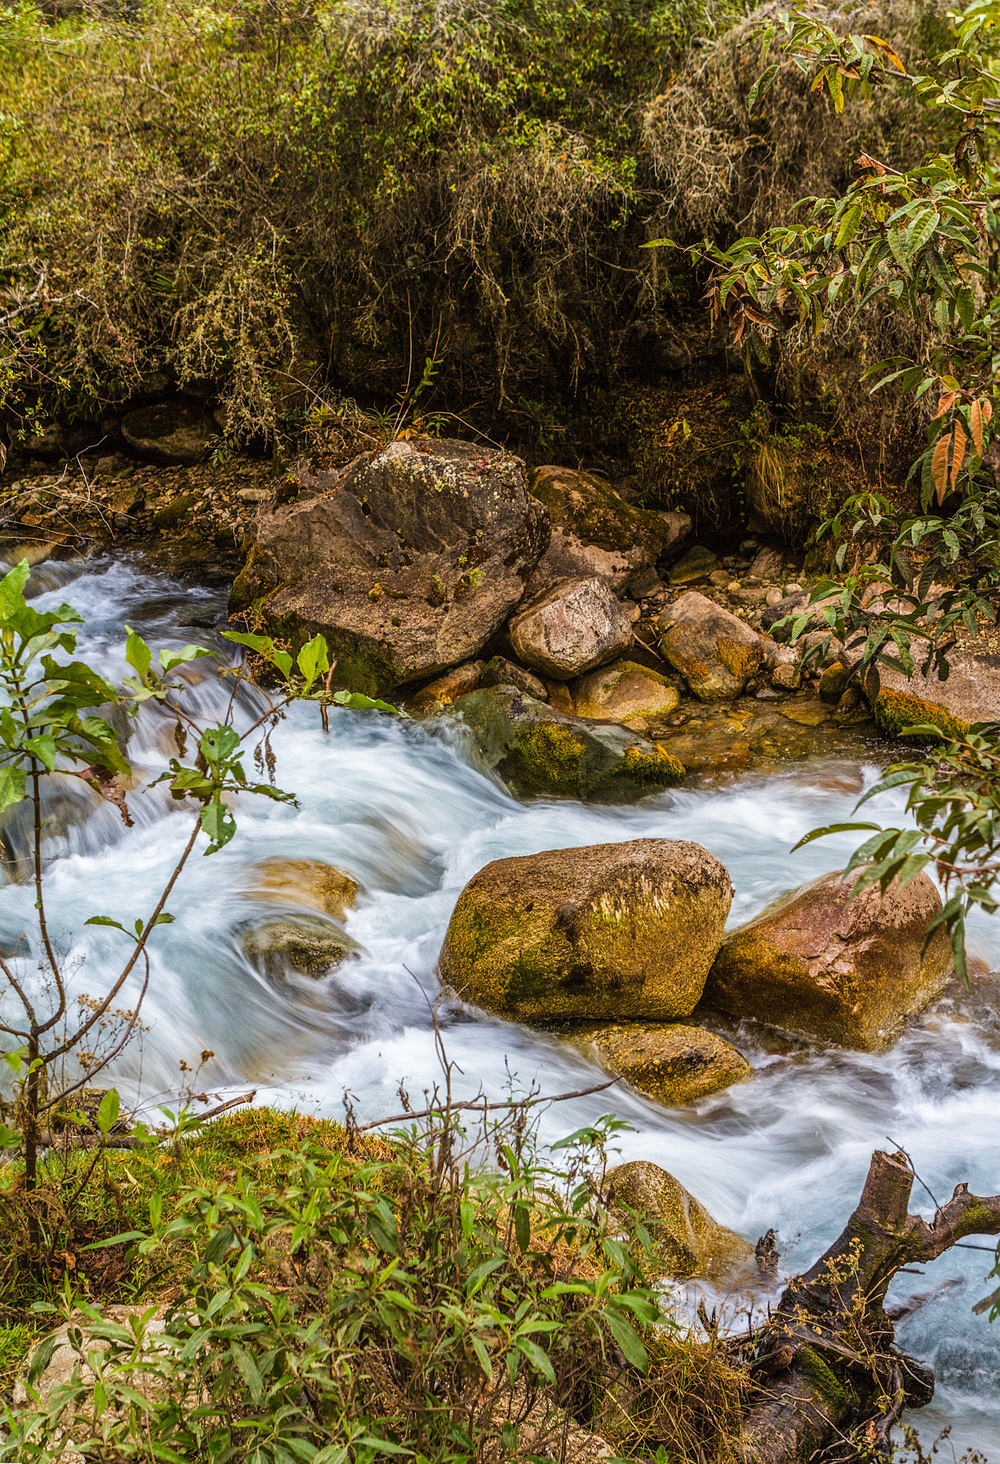 Ali-Barqawi-Studios-Explore-Series-Travel-Adventure-Documentary-C4CGAZA-Peru-MachuPicchu-2015-132.jpg